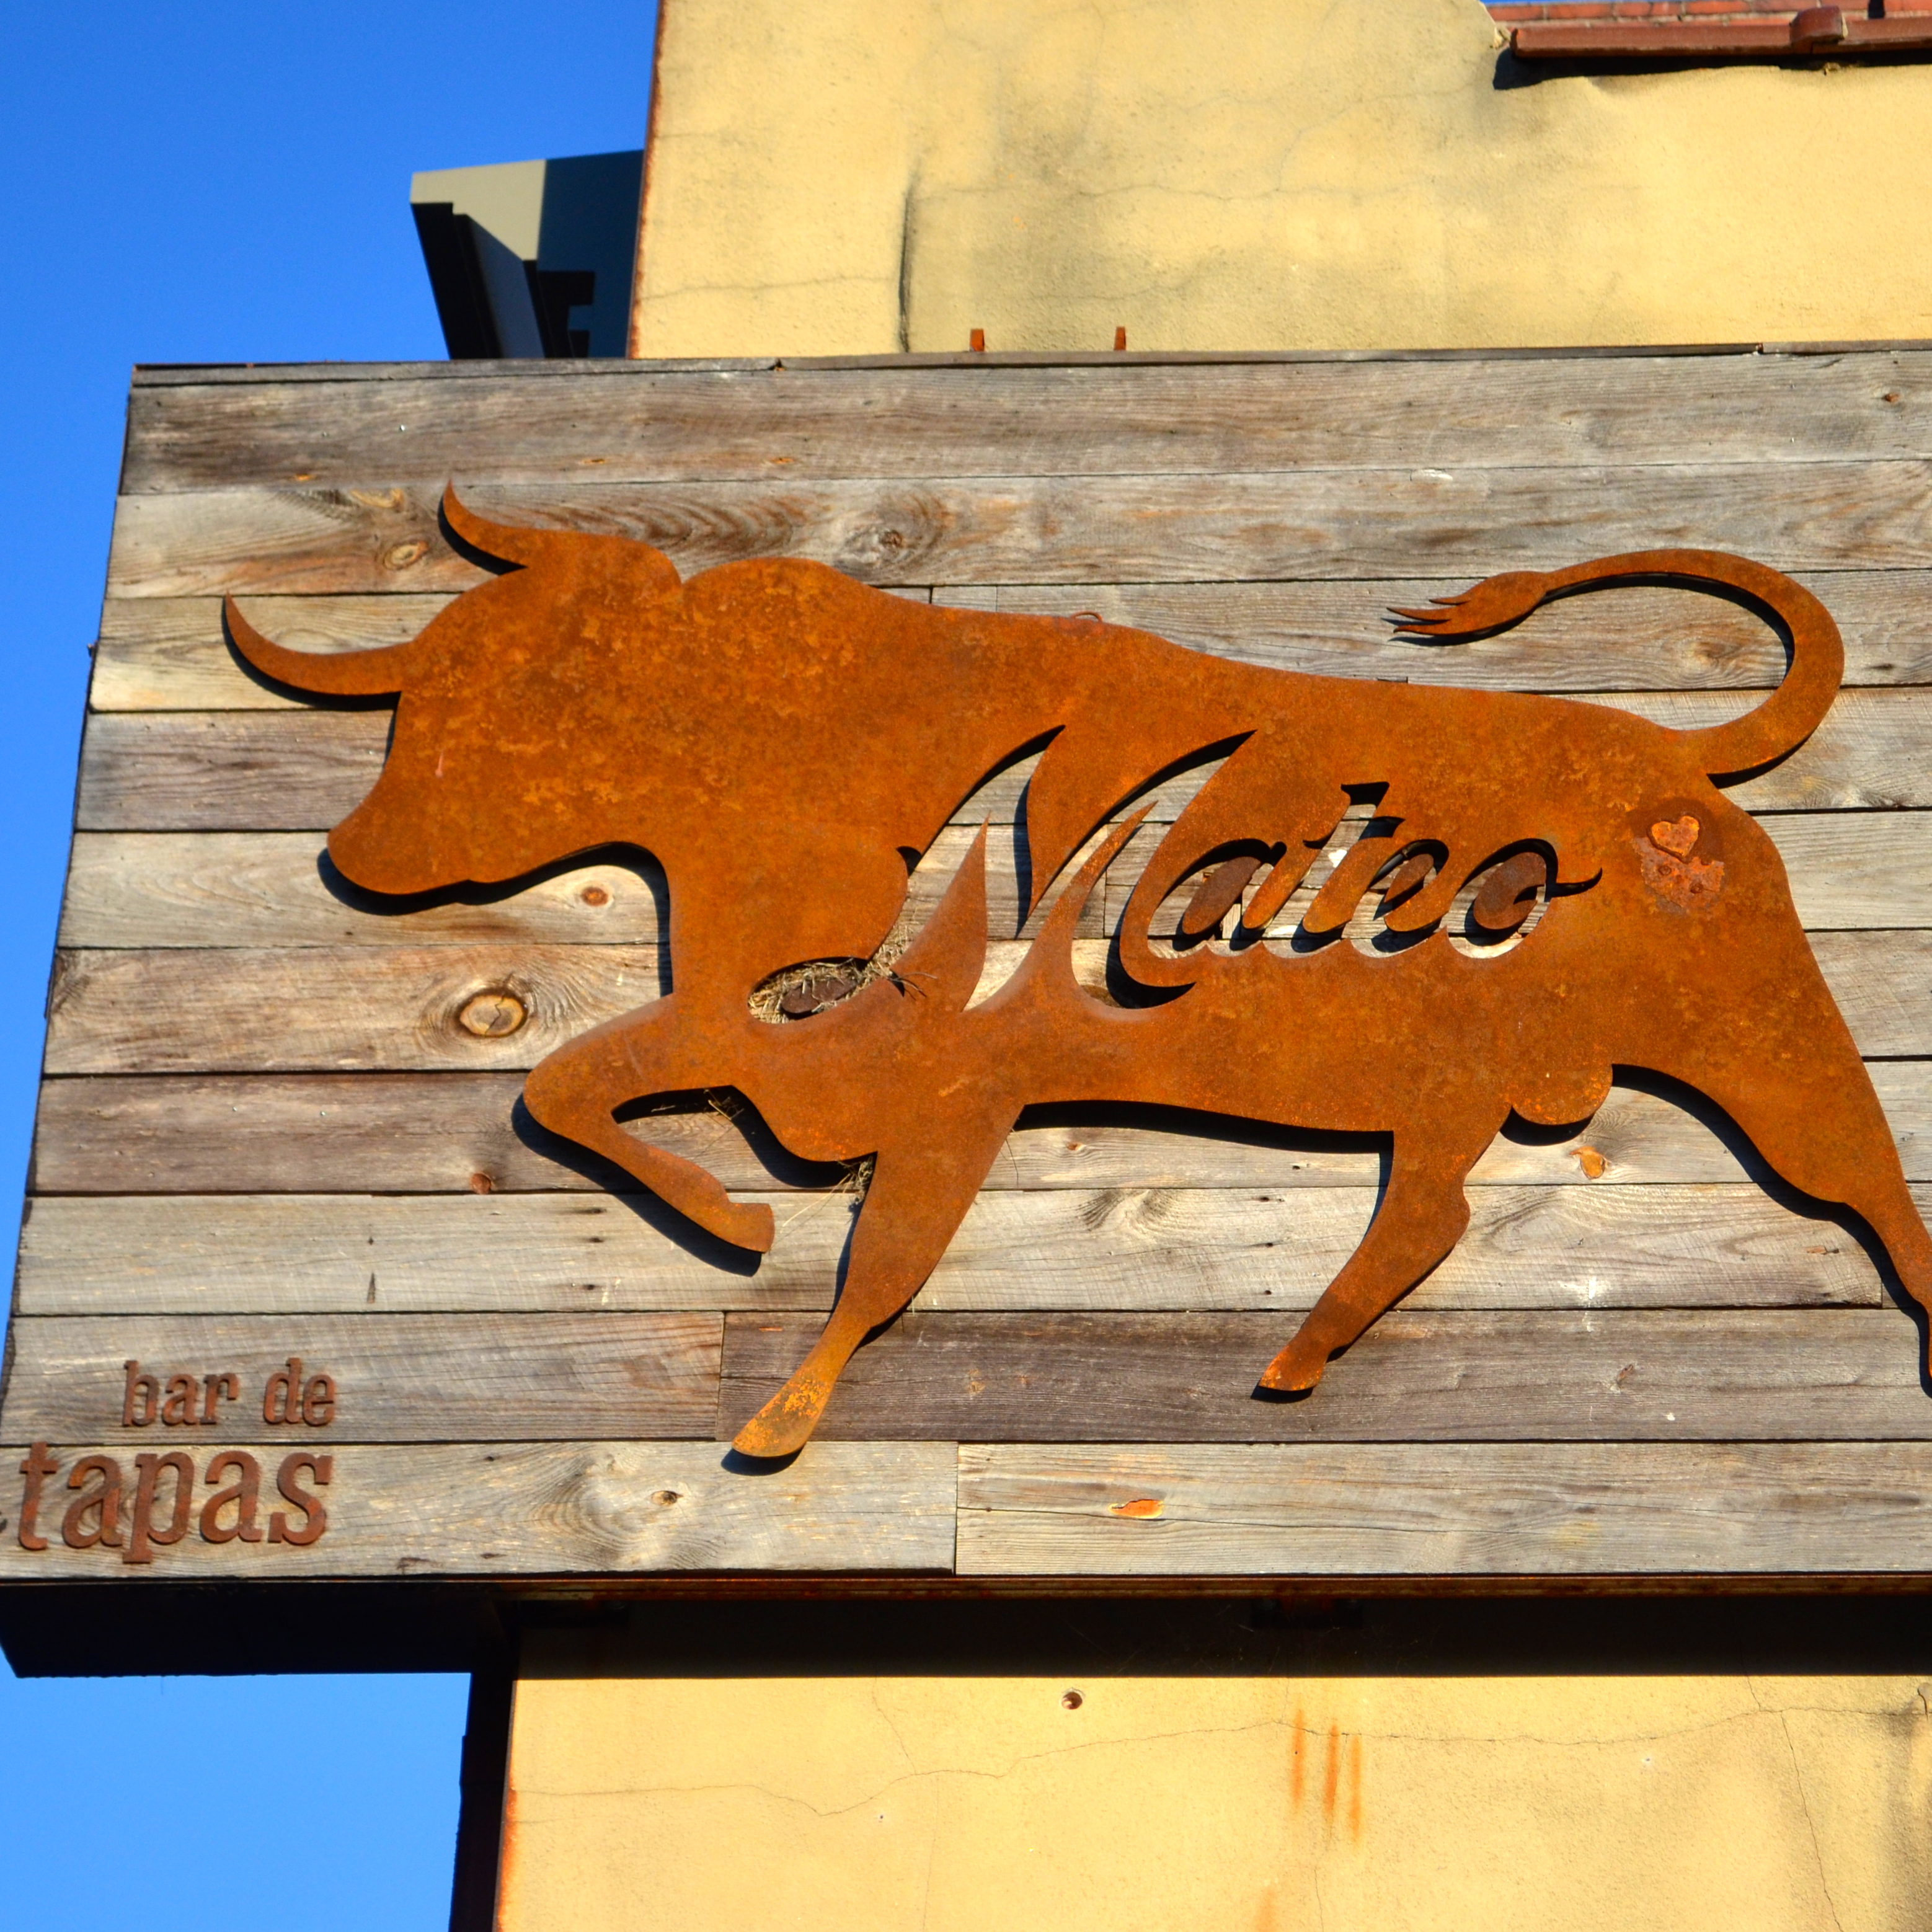 TAPAS AT MATEO - After Orange County